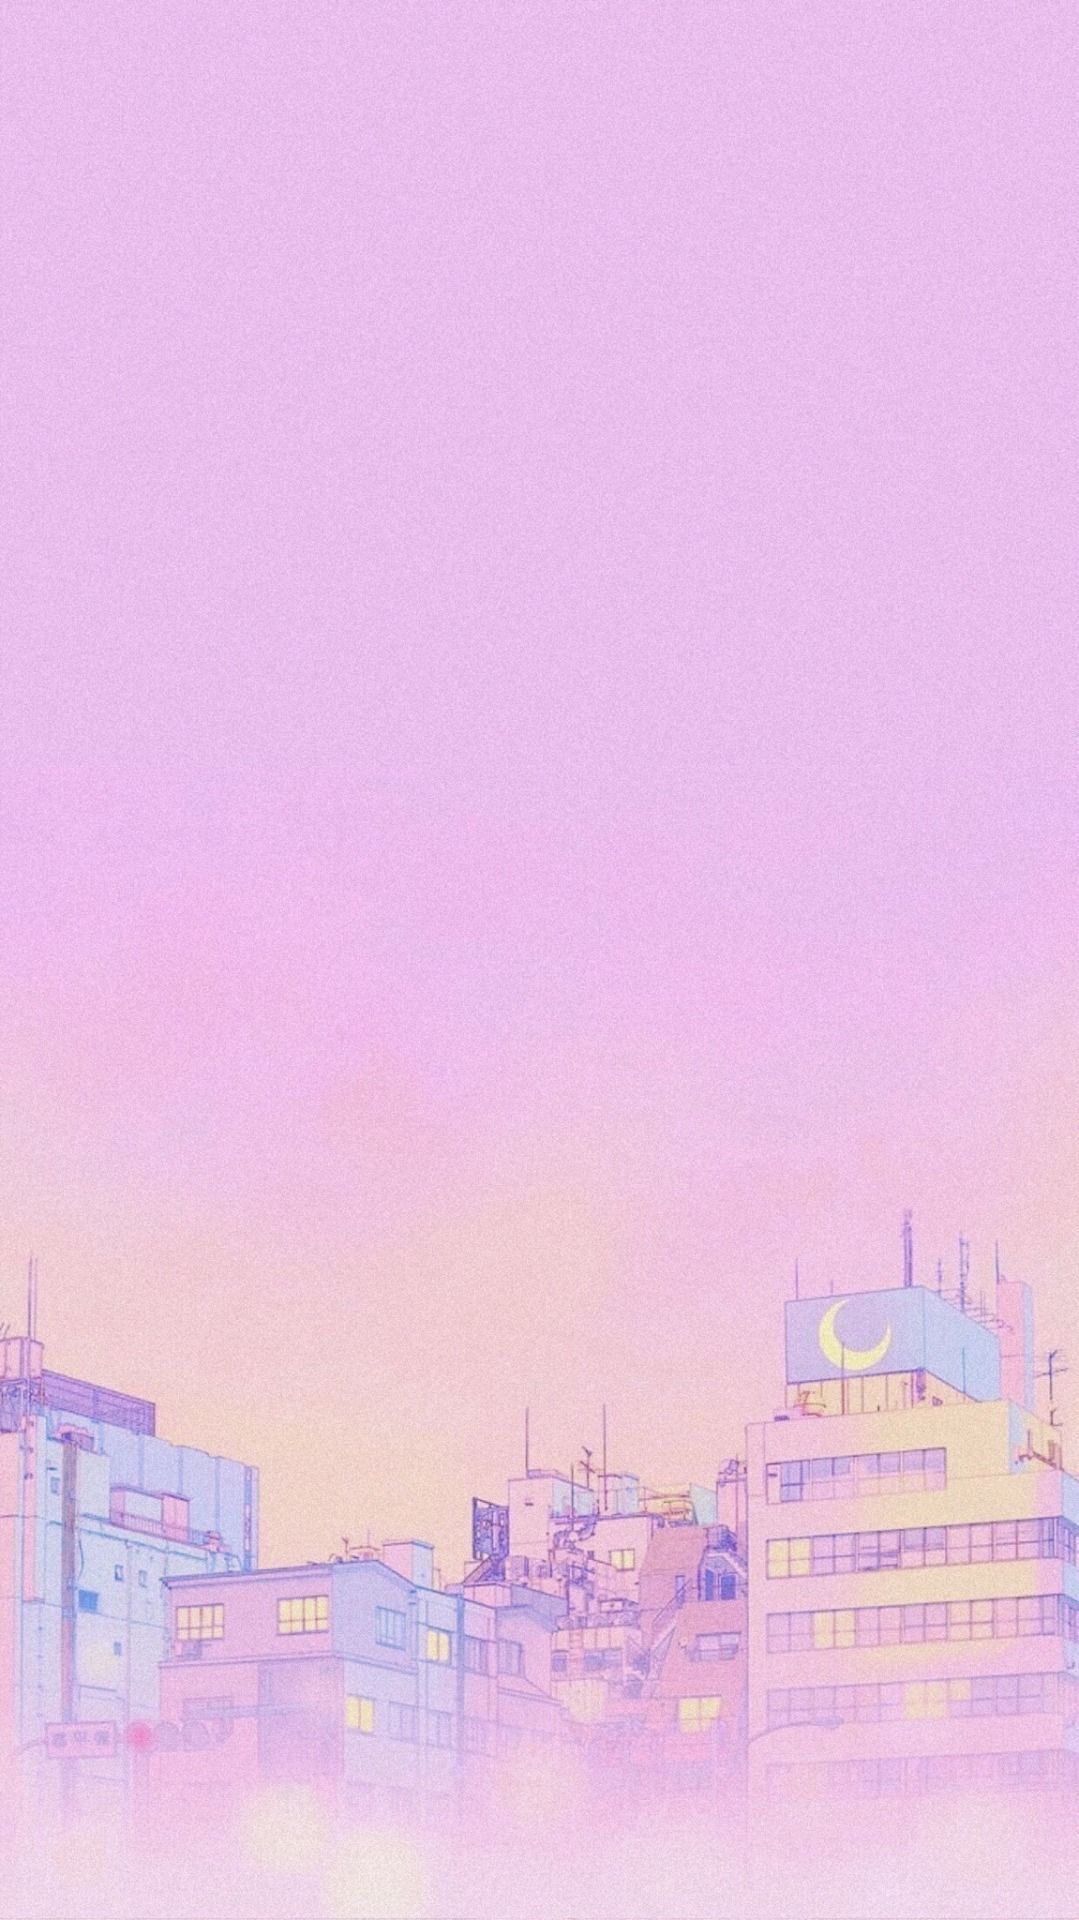 90s Anime Anime Wallpaper Iphone Soft Wallpaper Anime Scenery Wallpaper